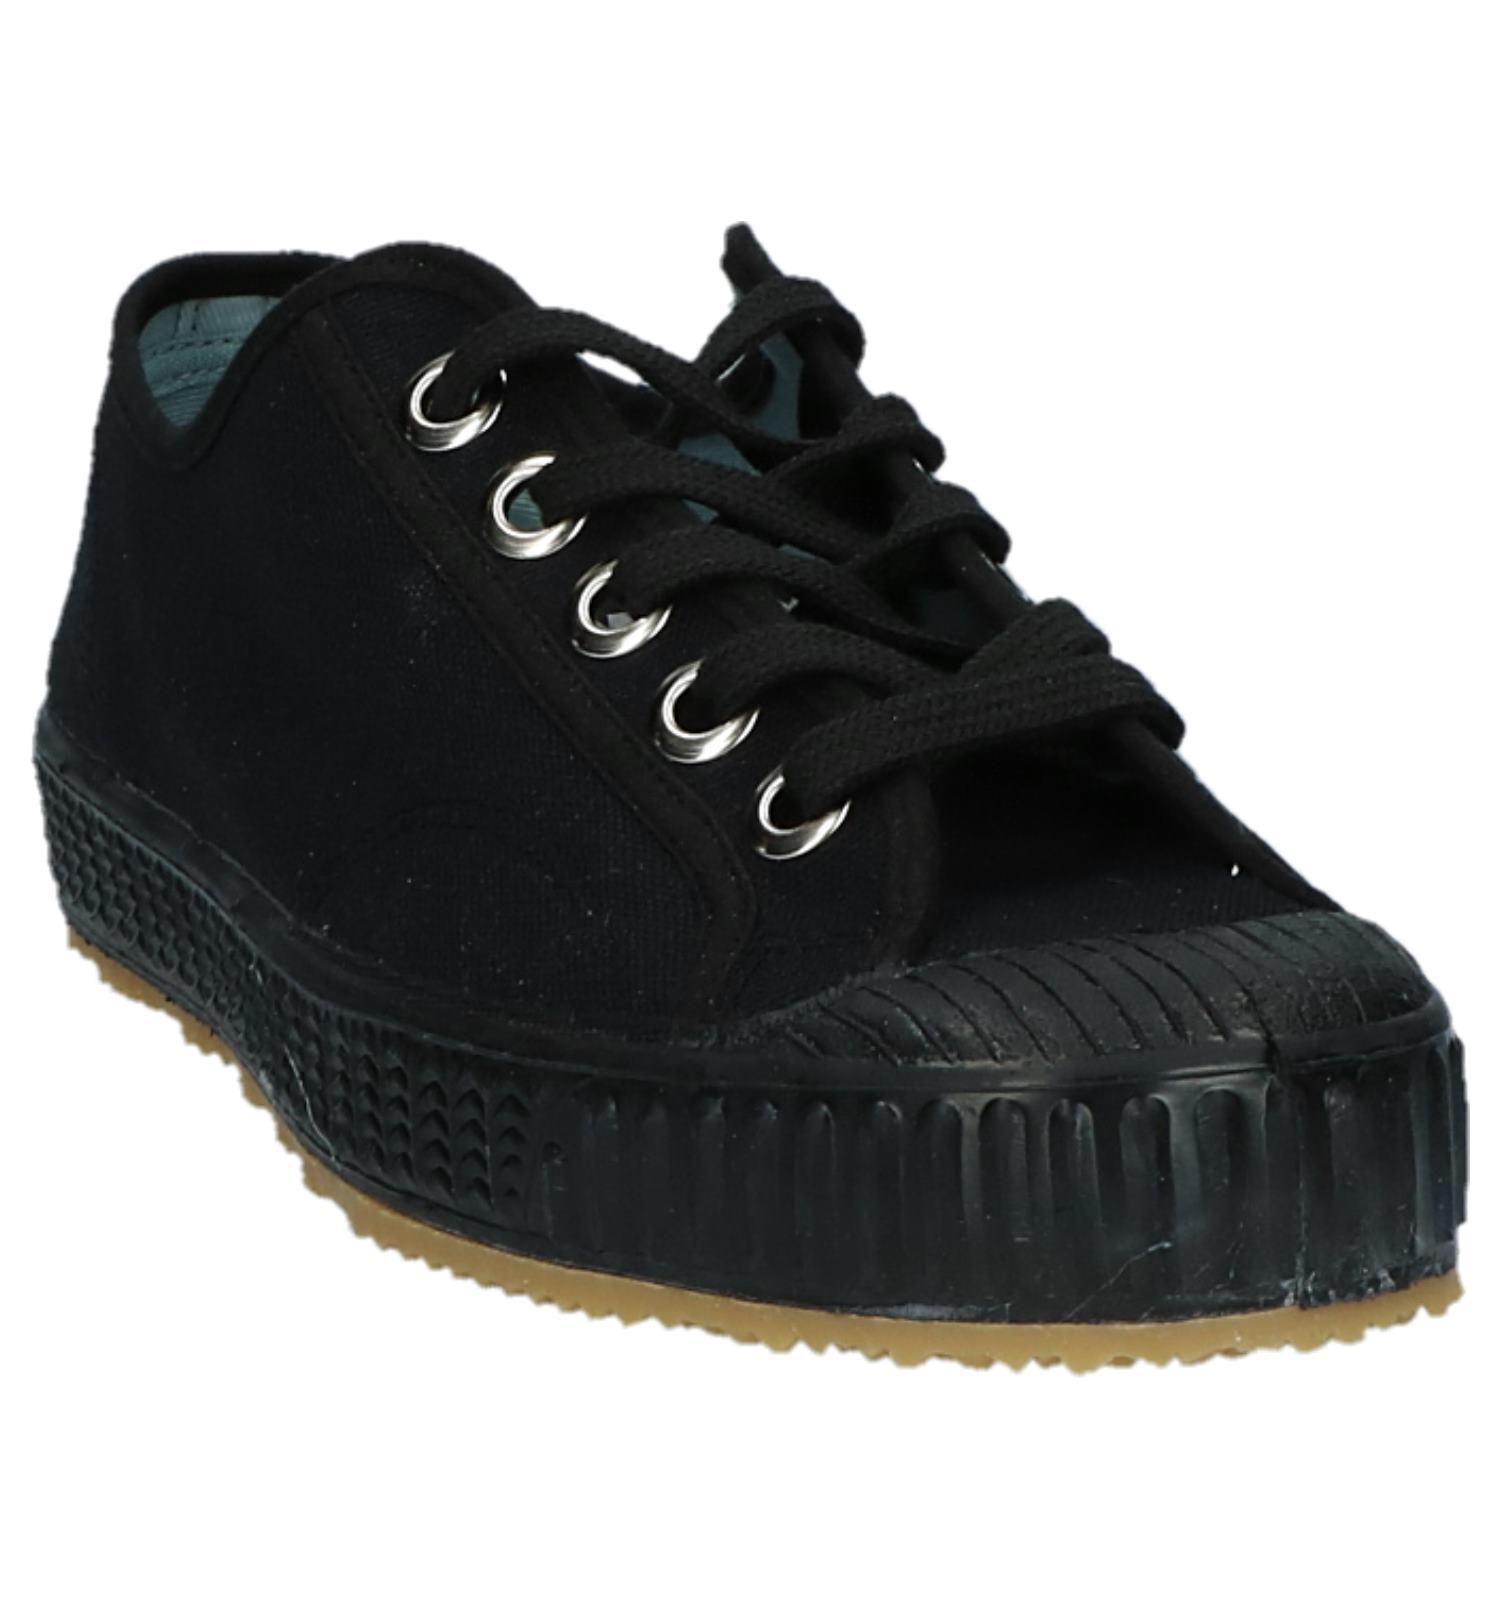 Sneakers Zwarte Zwarte Lenin Komrads Komrads 34c5ALqjSR